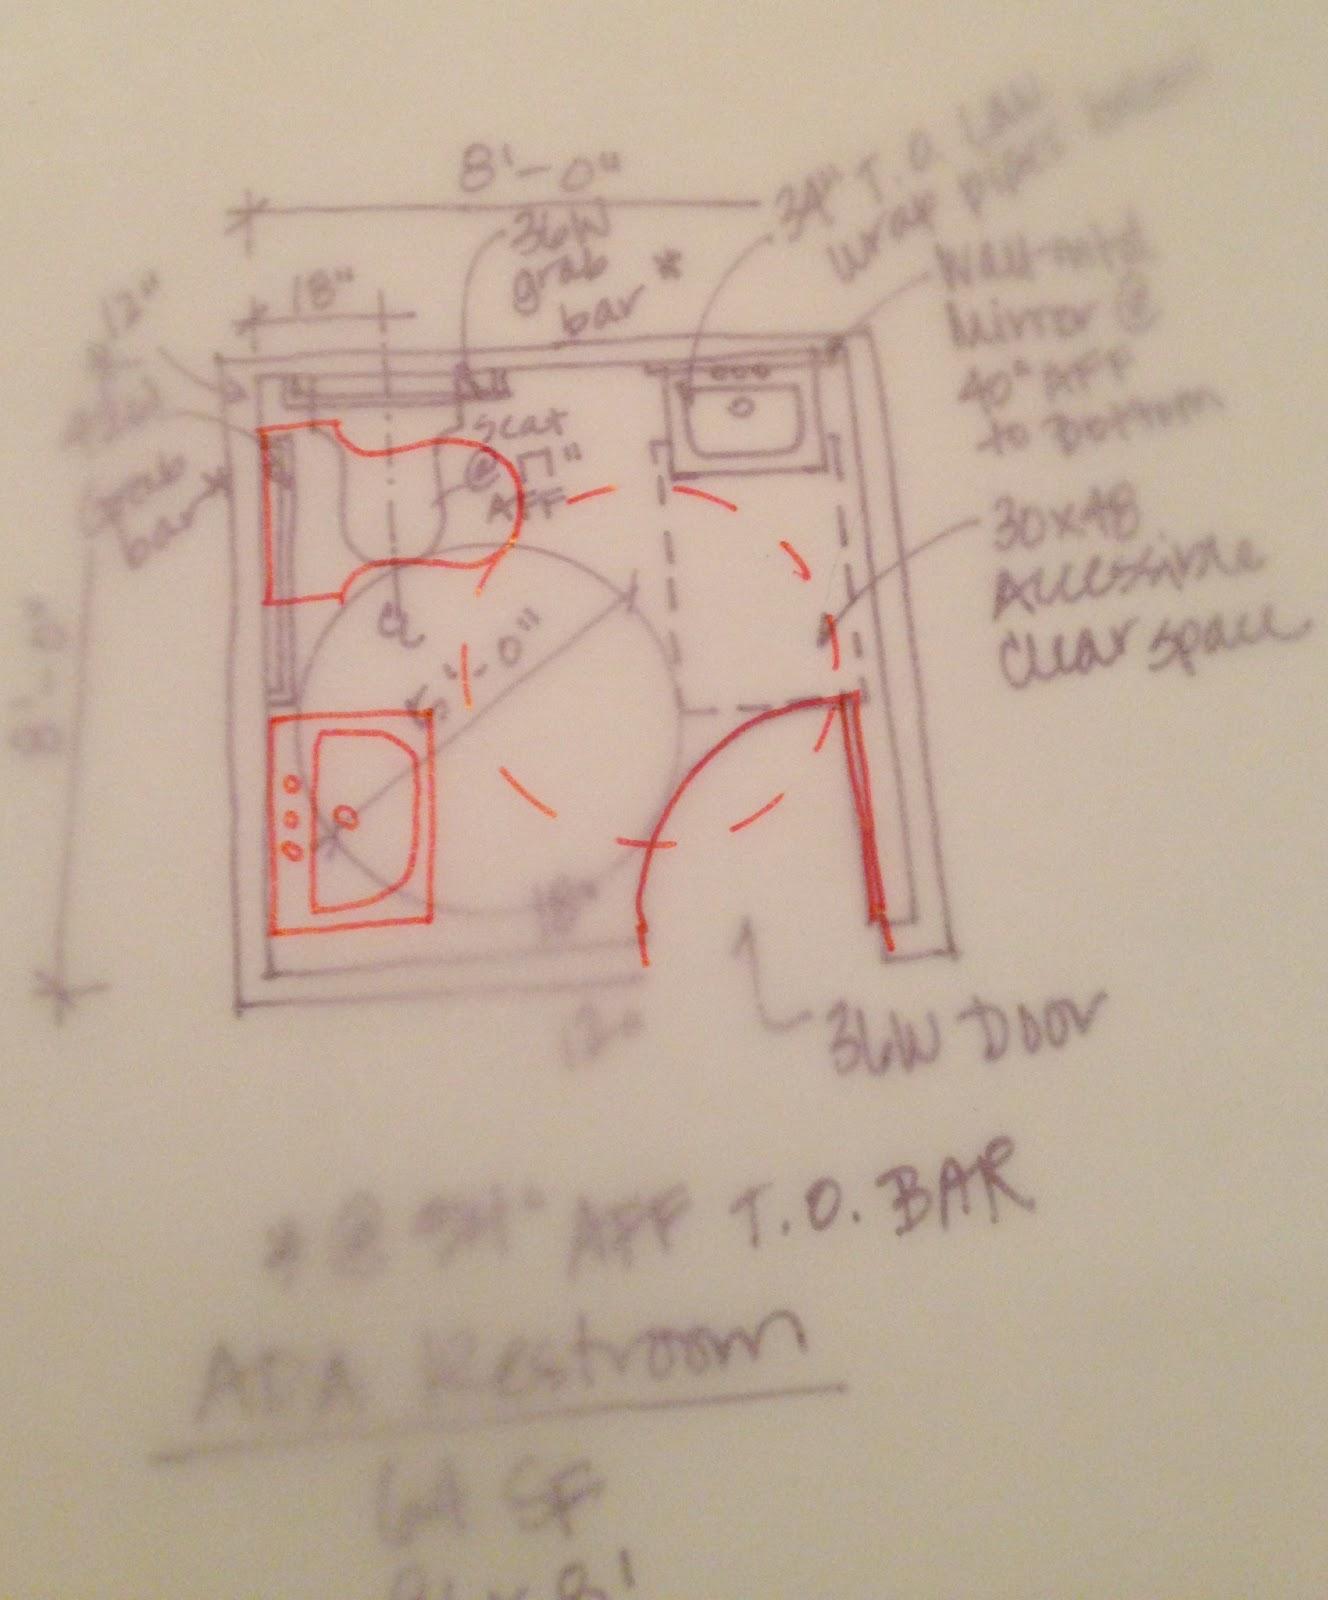 Ada Bathroom Door Swing Out the ncidq diaries: april 2013